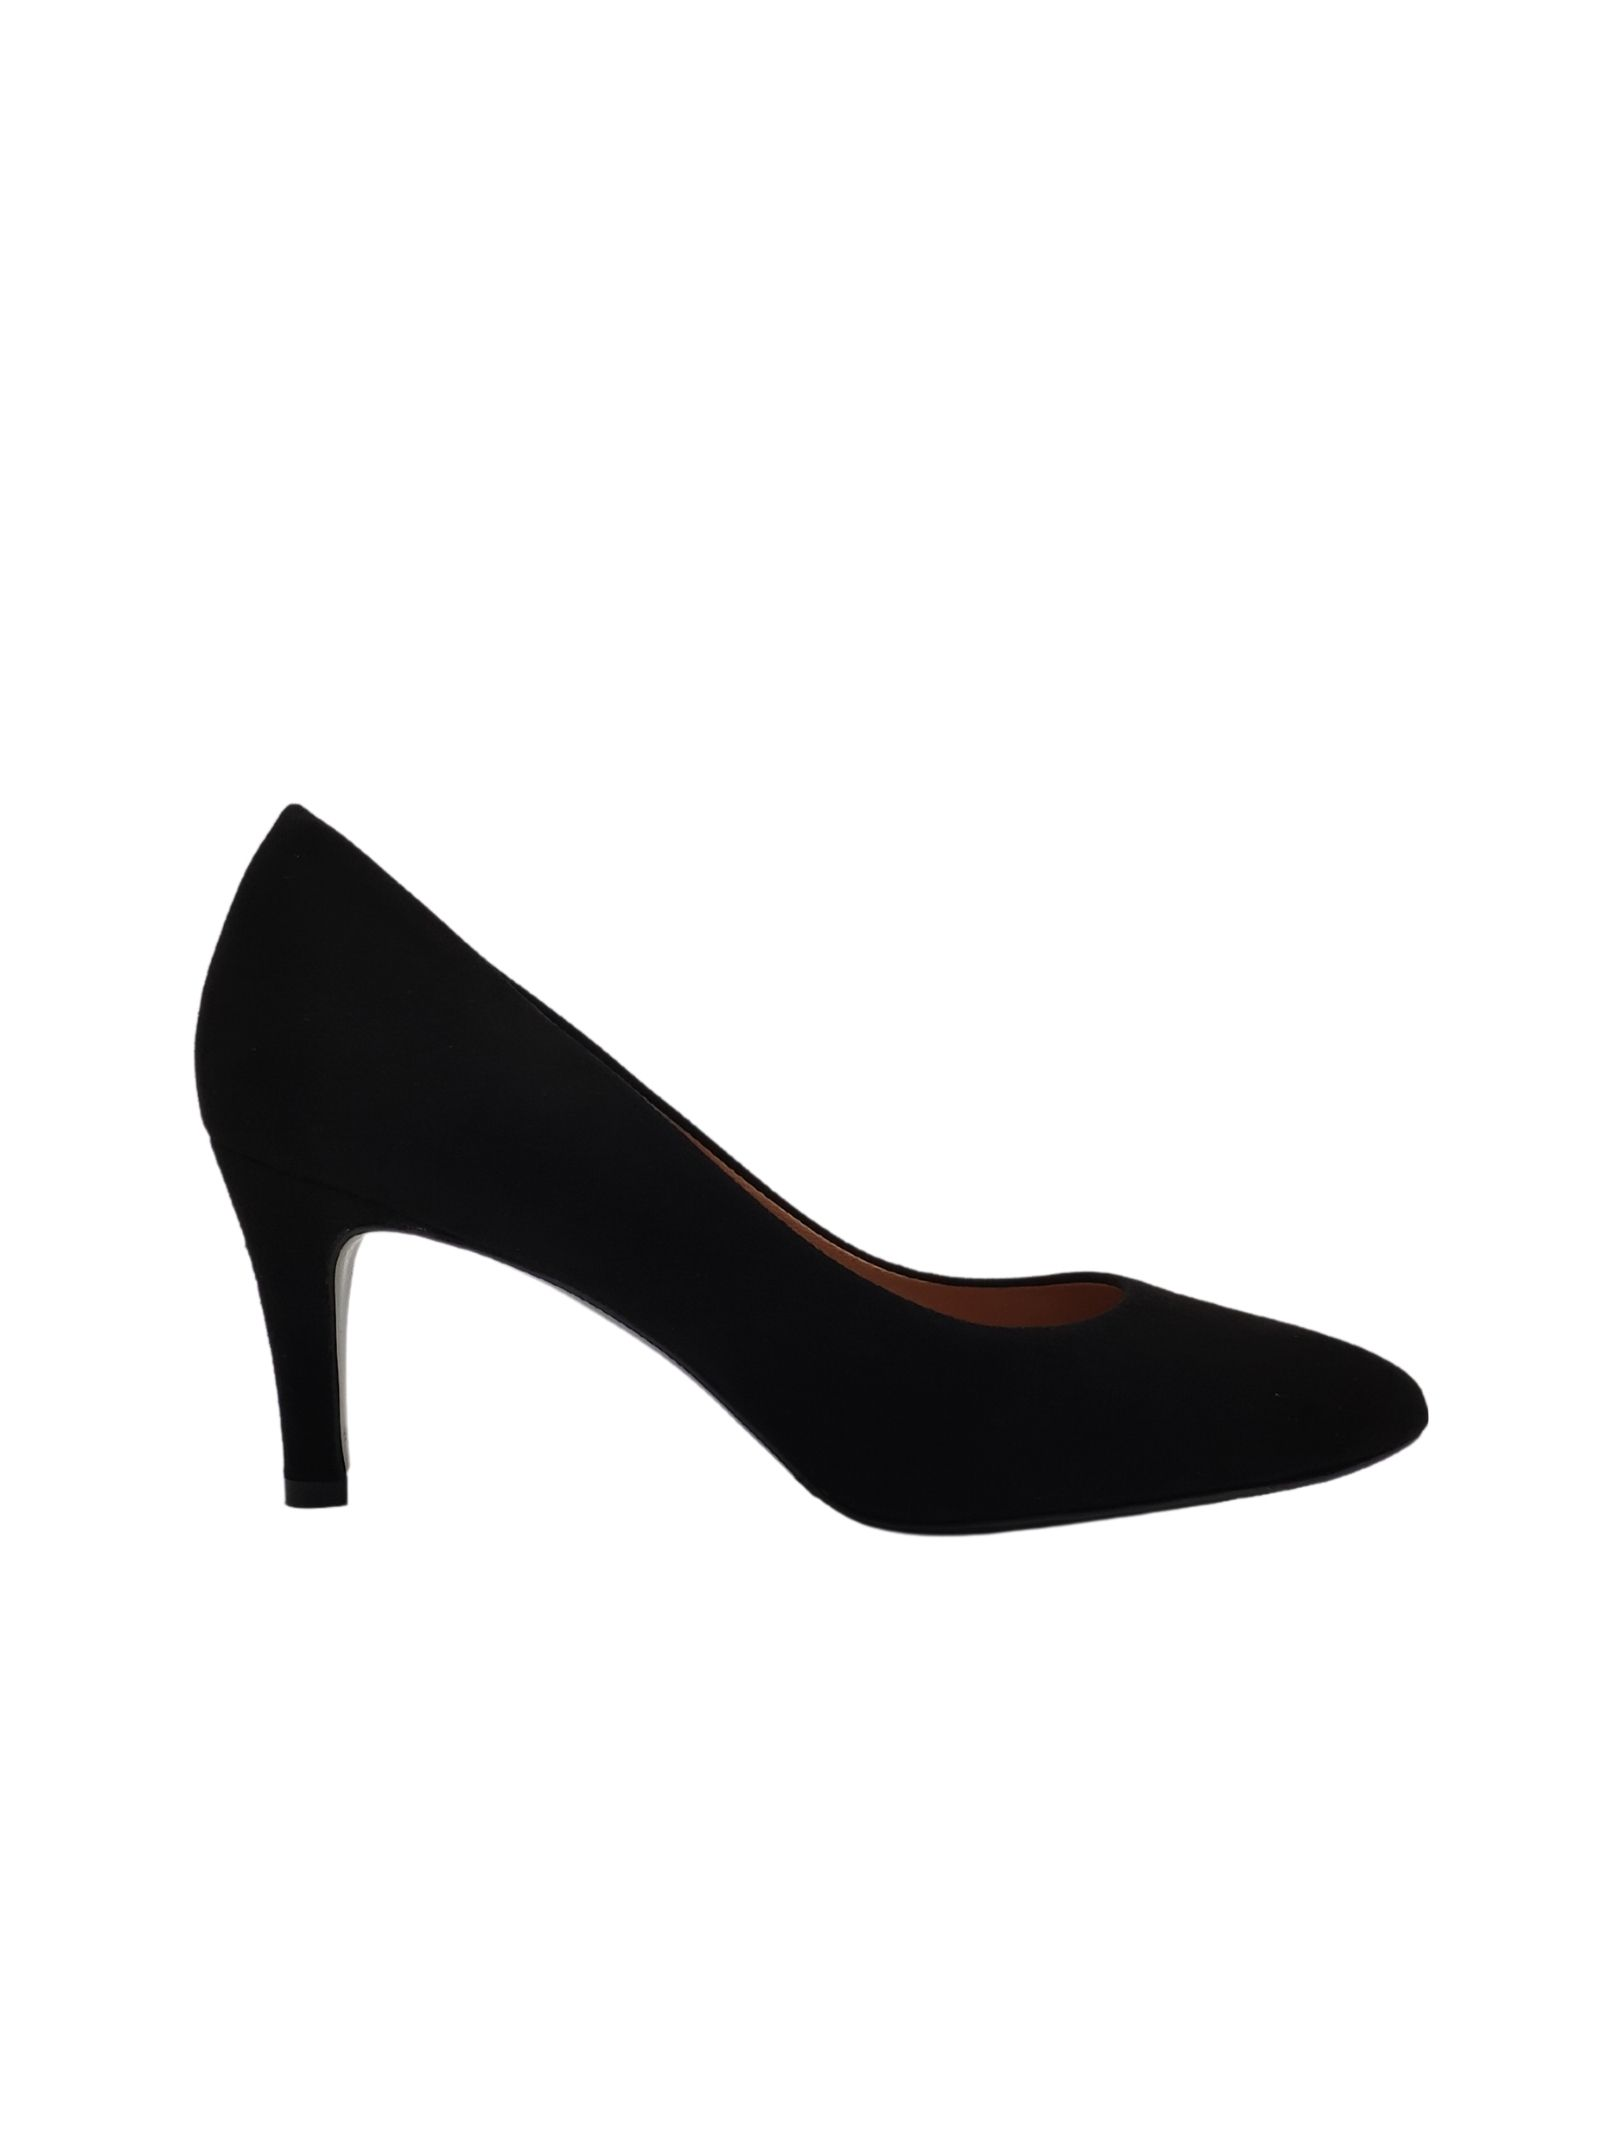 Décolleté Heel Woman Spatarella | Pumps | FLEXNERO